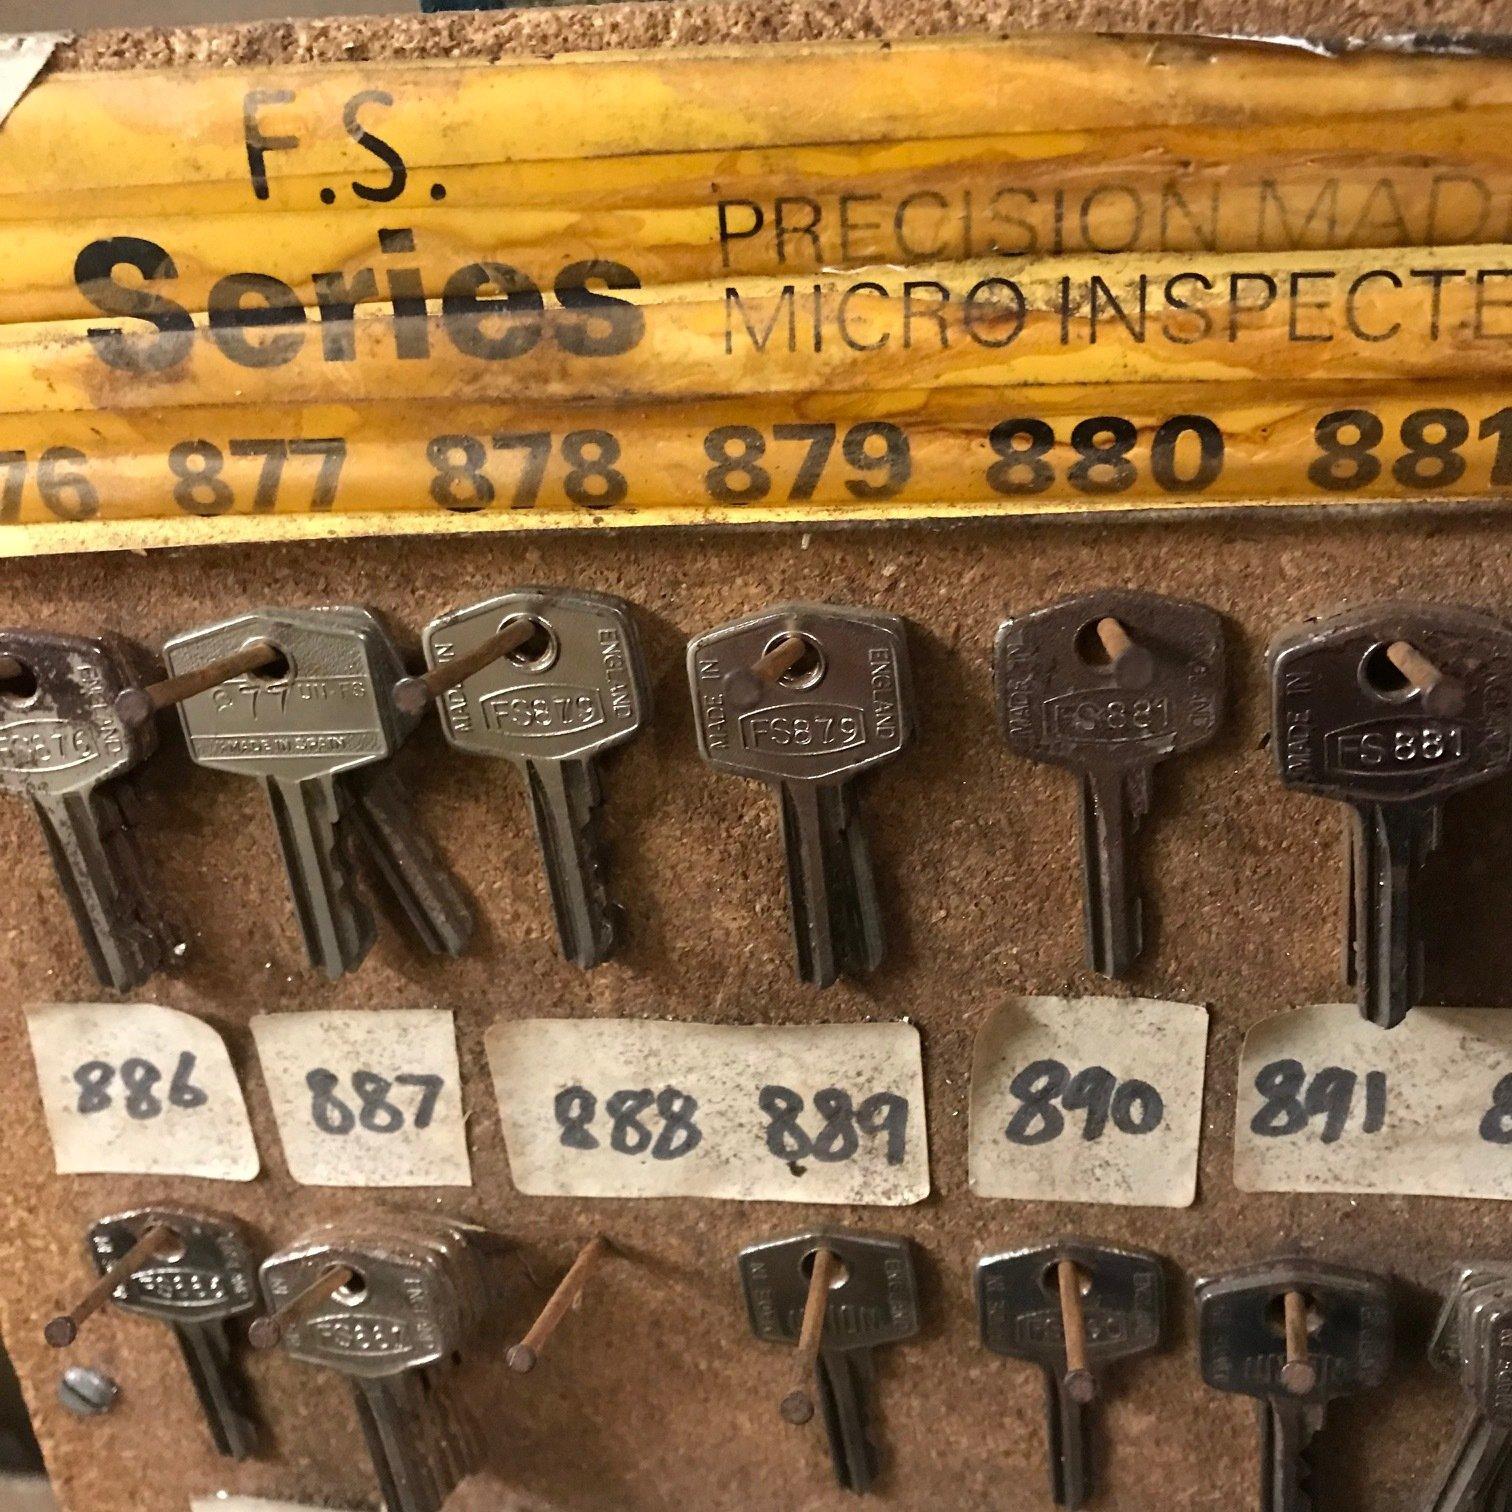 FS Series Keys 00048